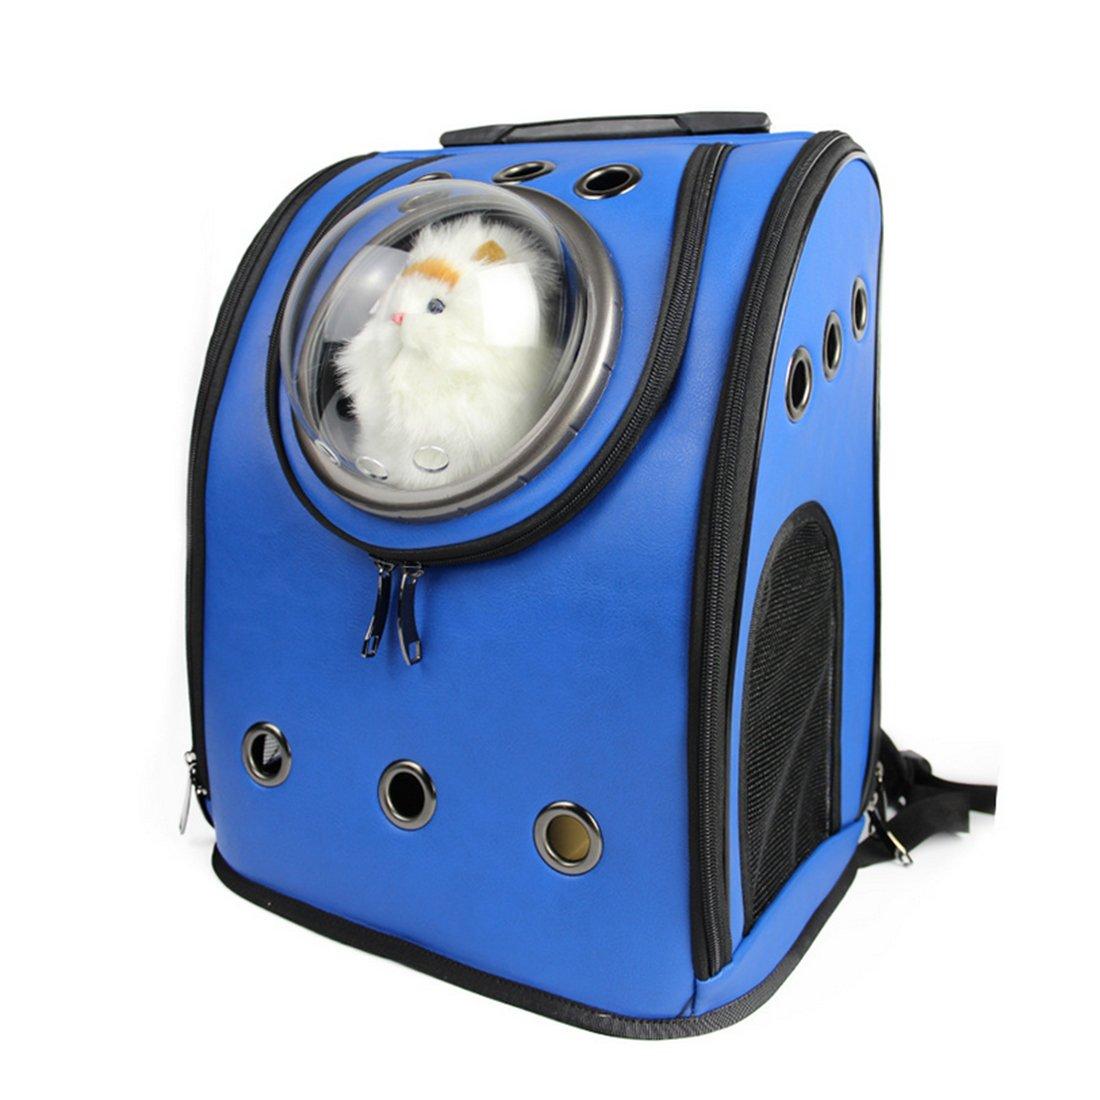 Petforu Pet Carrier Backpack, Space Capsule Dog Cat Small Animals Travel Bag – Blue